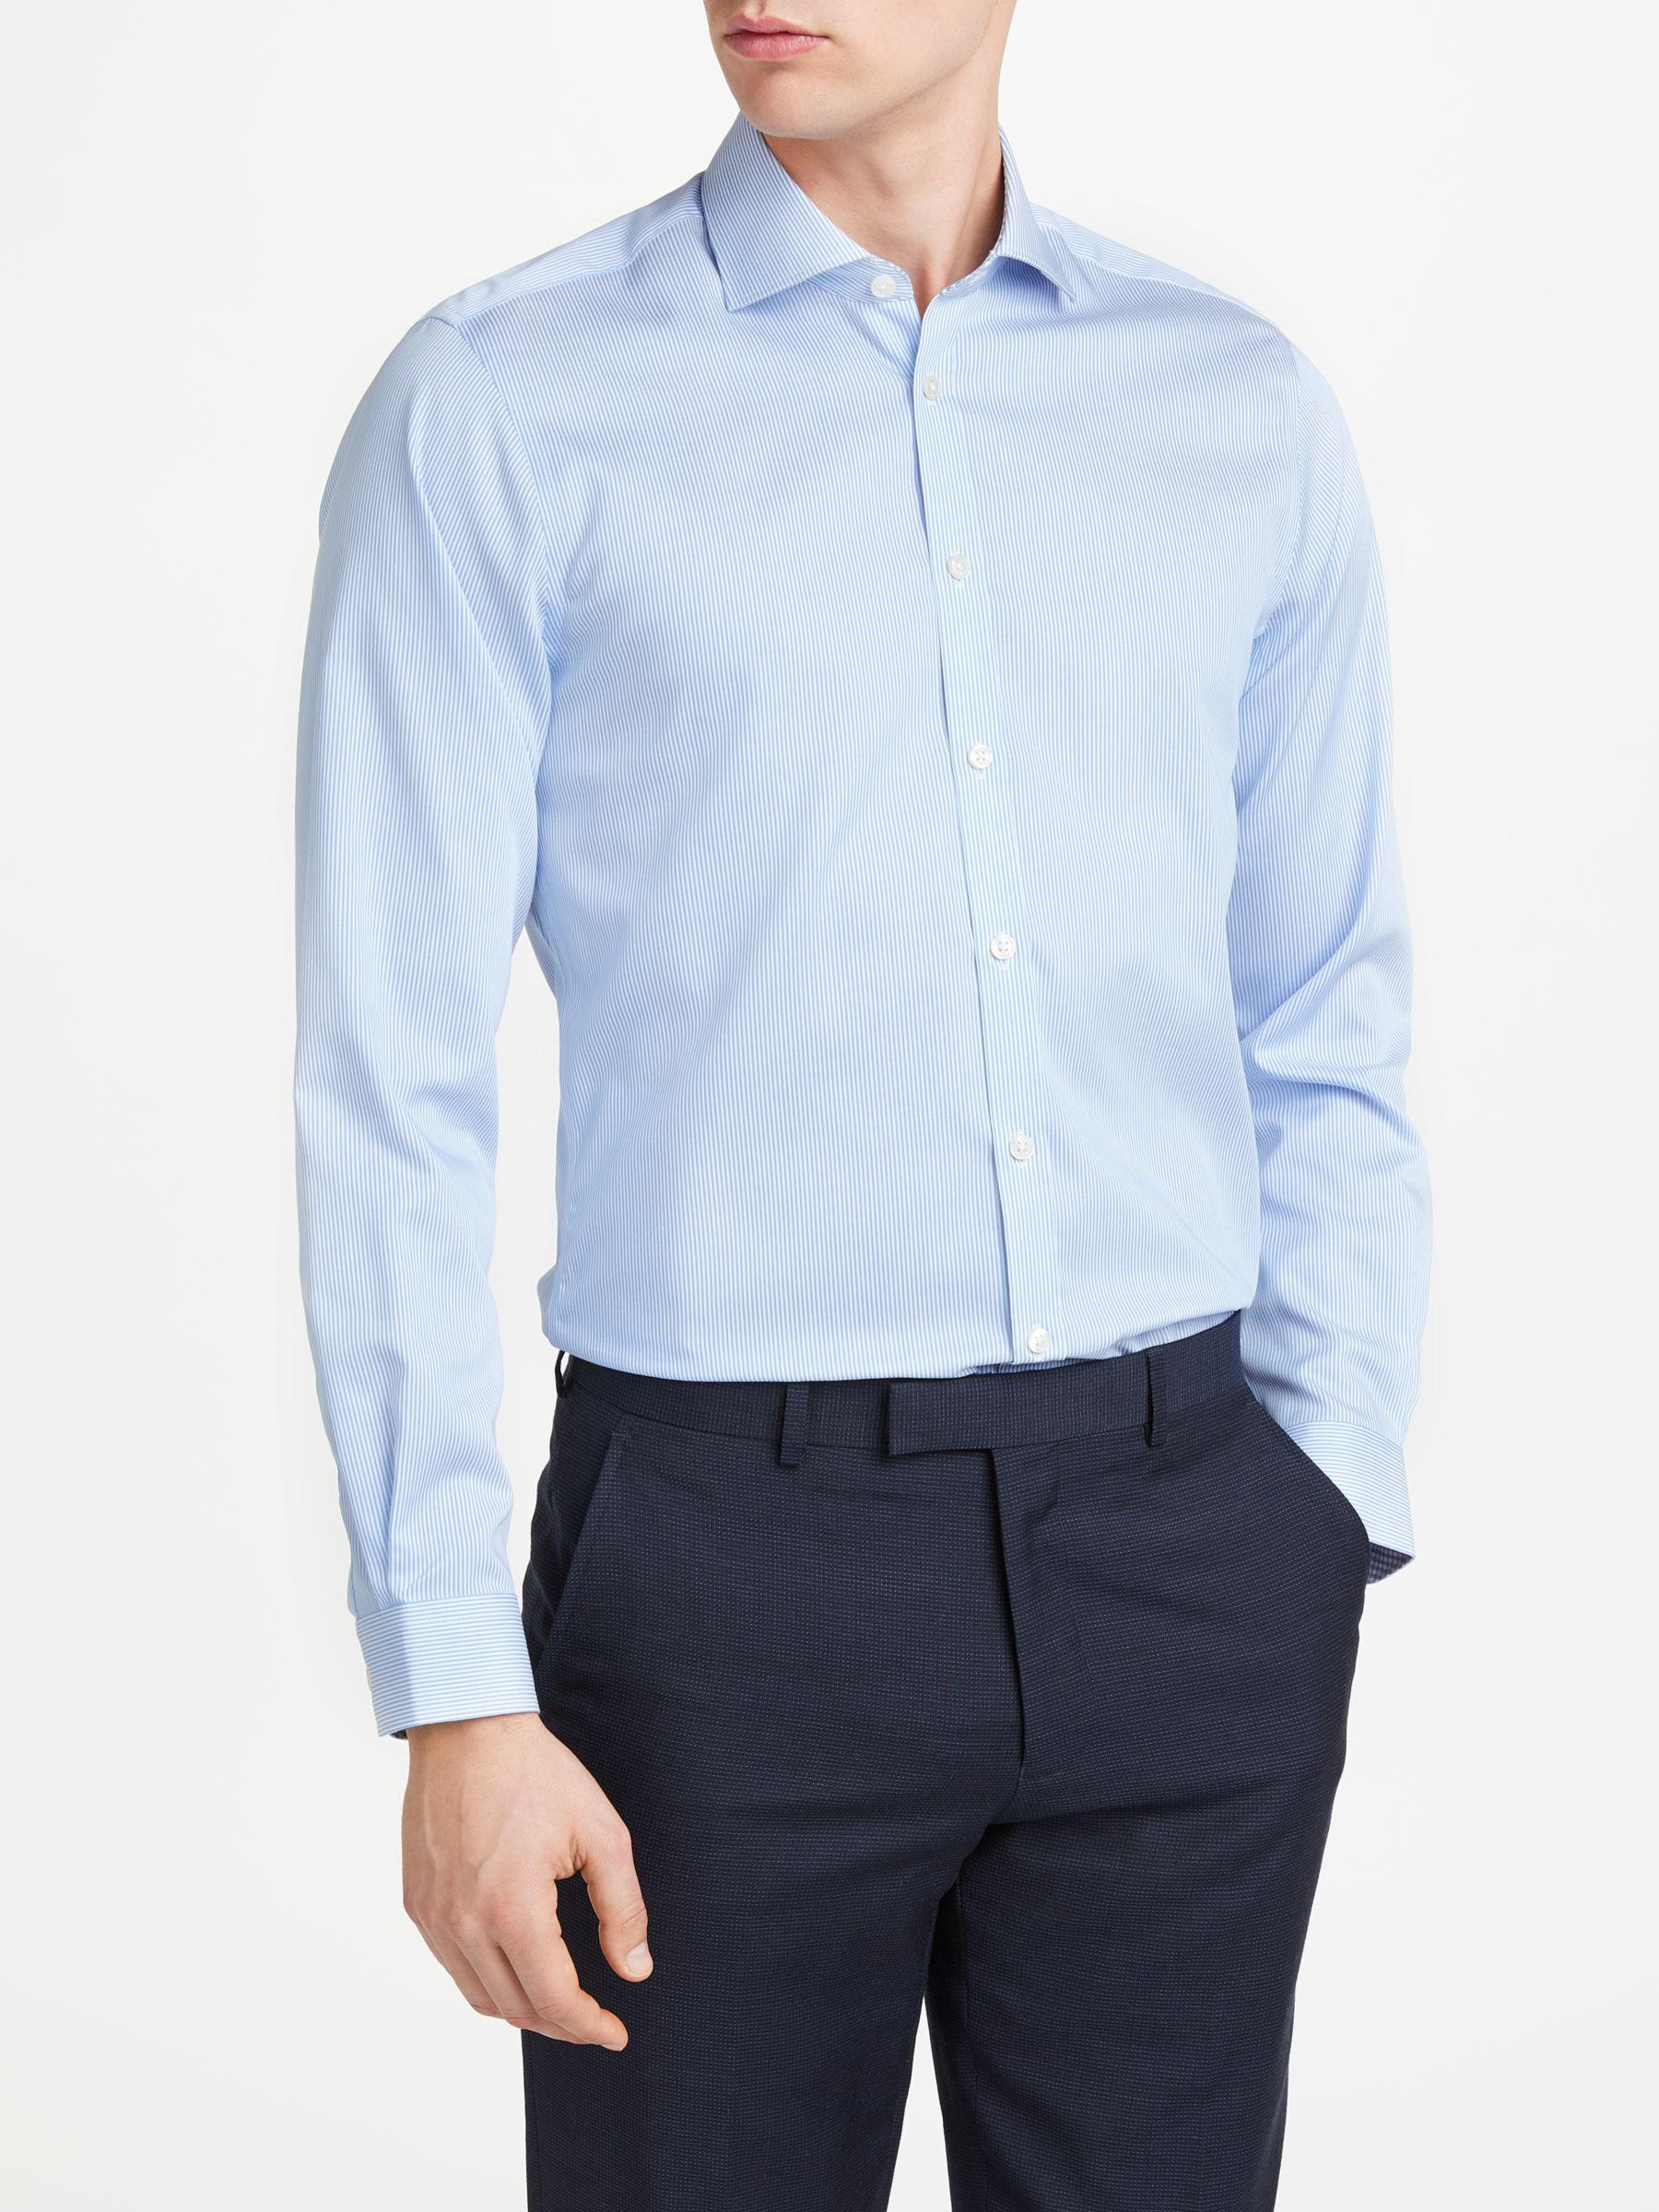 d1ec653ca204 John Lewis & Partners Non Iron Bengal Stripe Slim Fit Shirt, Blue at John  Lewis & Partners